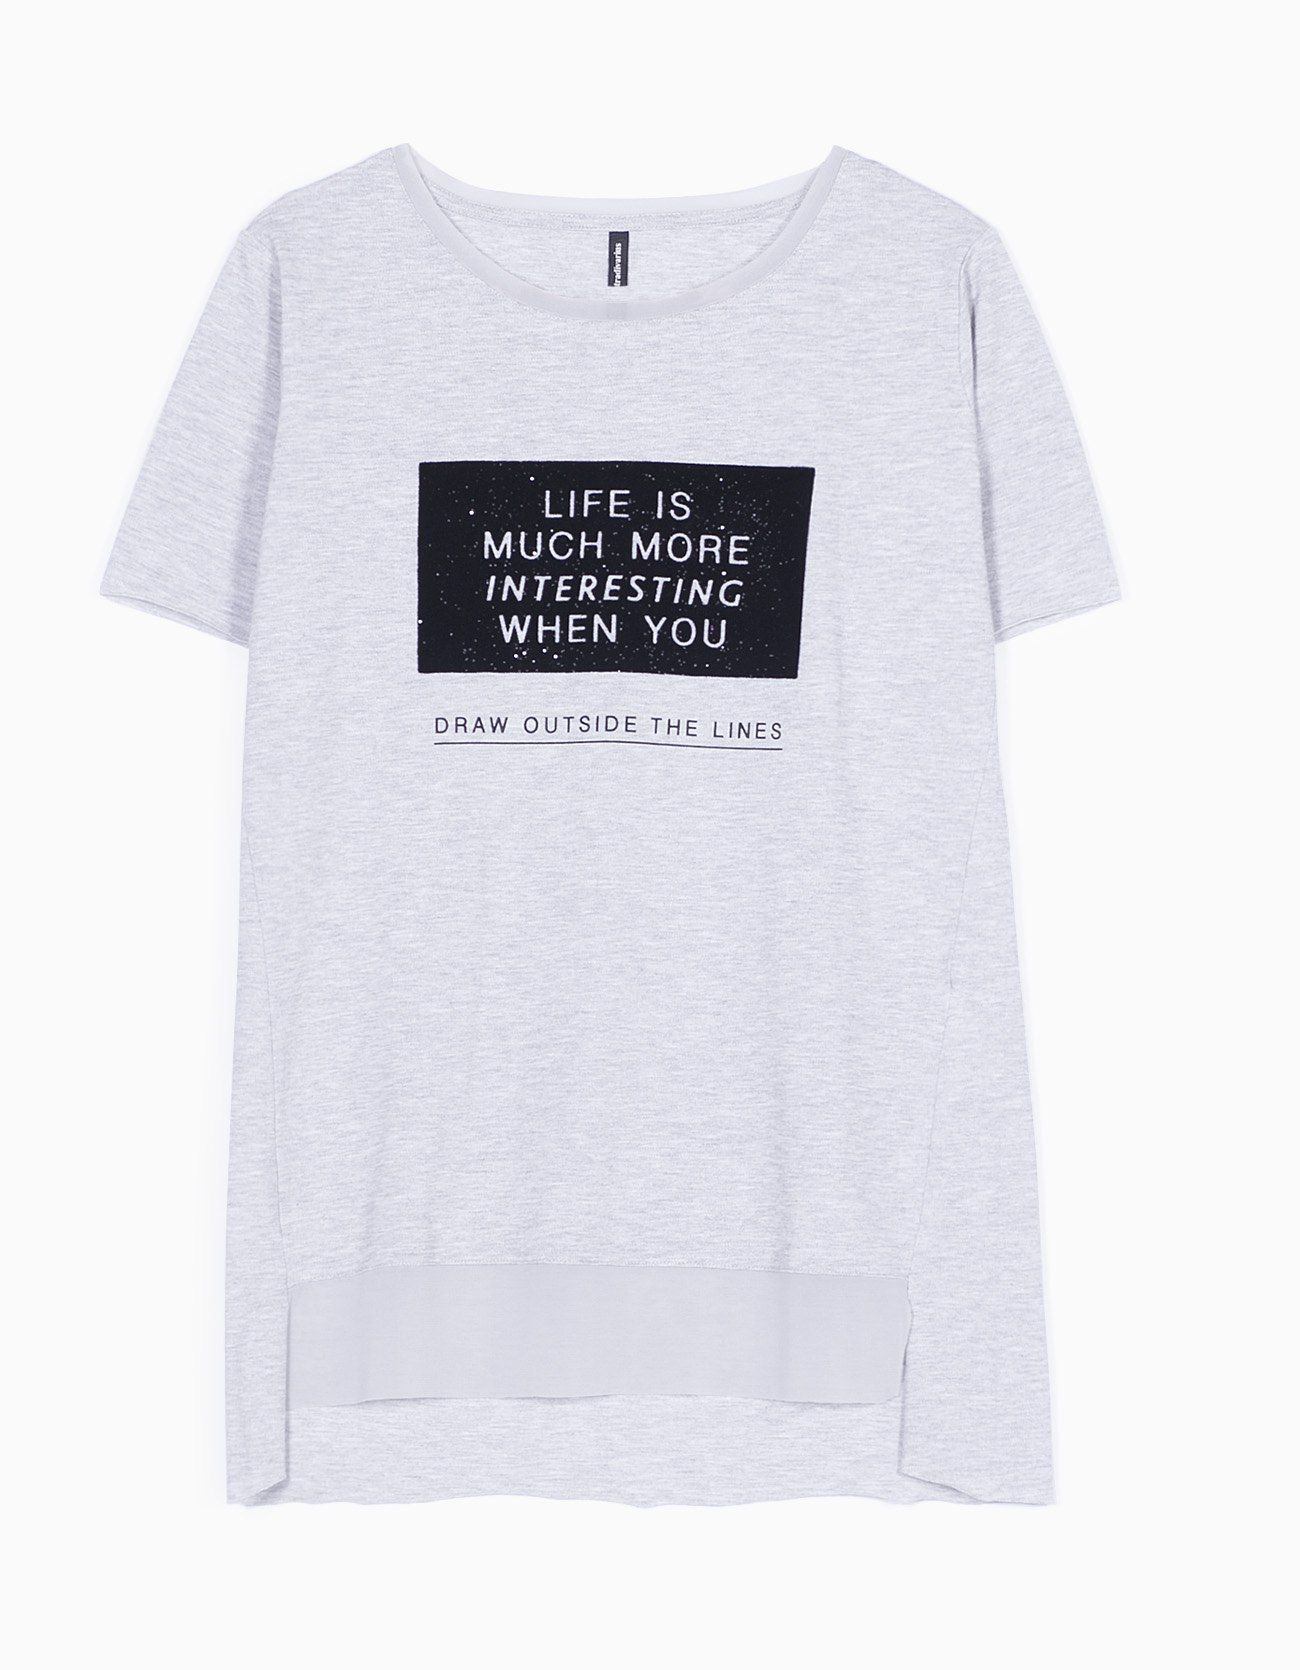 Camiseta piqué con textos - CAMISETAS - MUJER | Stradivarius España